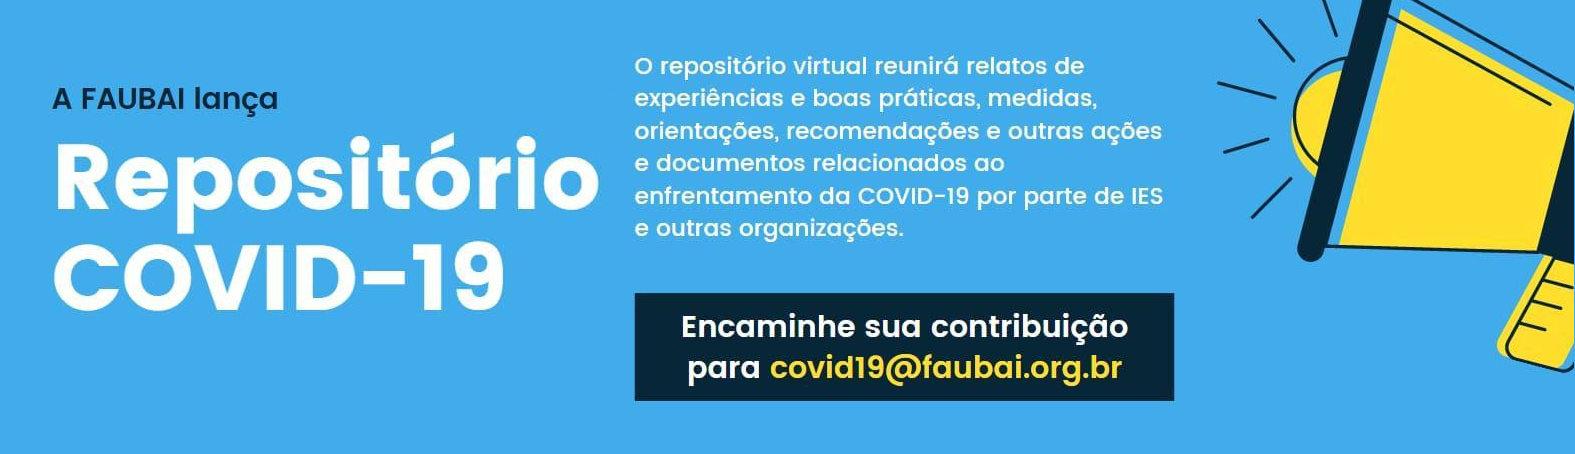 REPOSITÓRIO COVID-19 FAUBAI / FAUBAI COVID-19 REPOSITORY